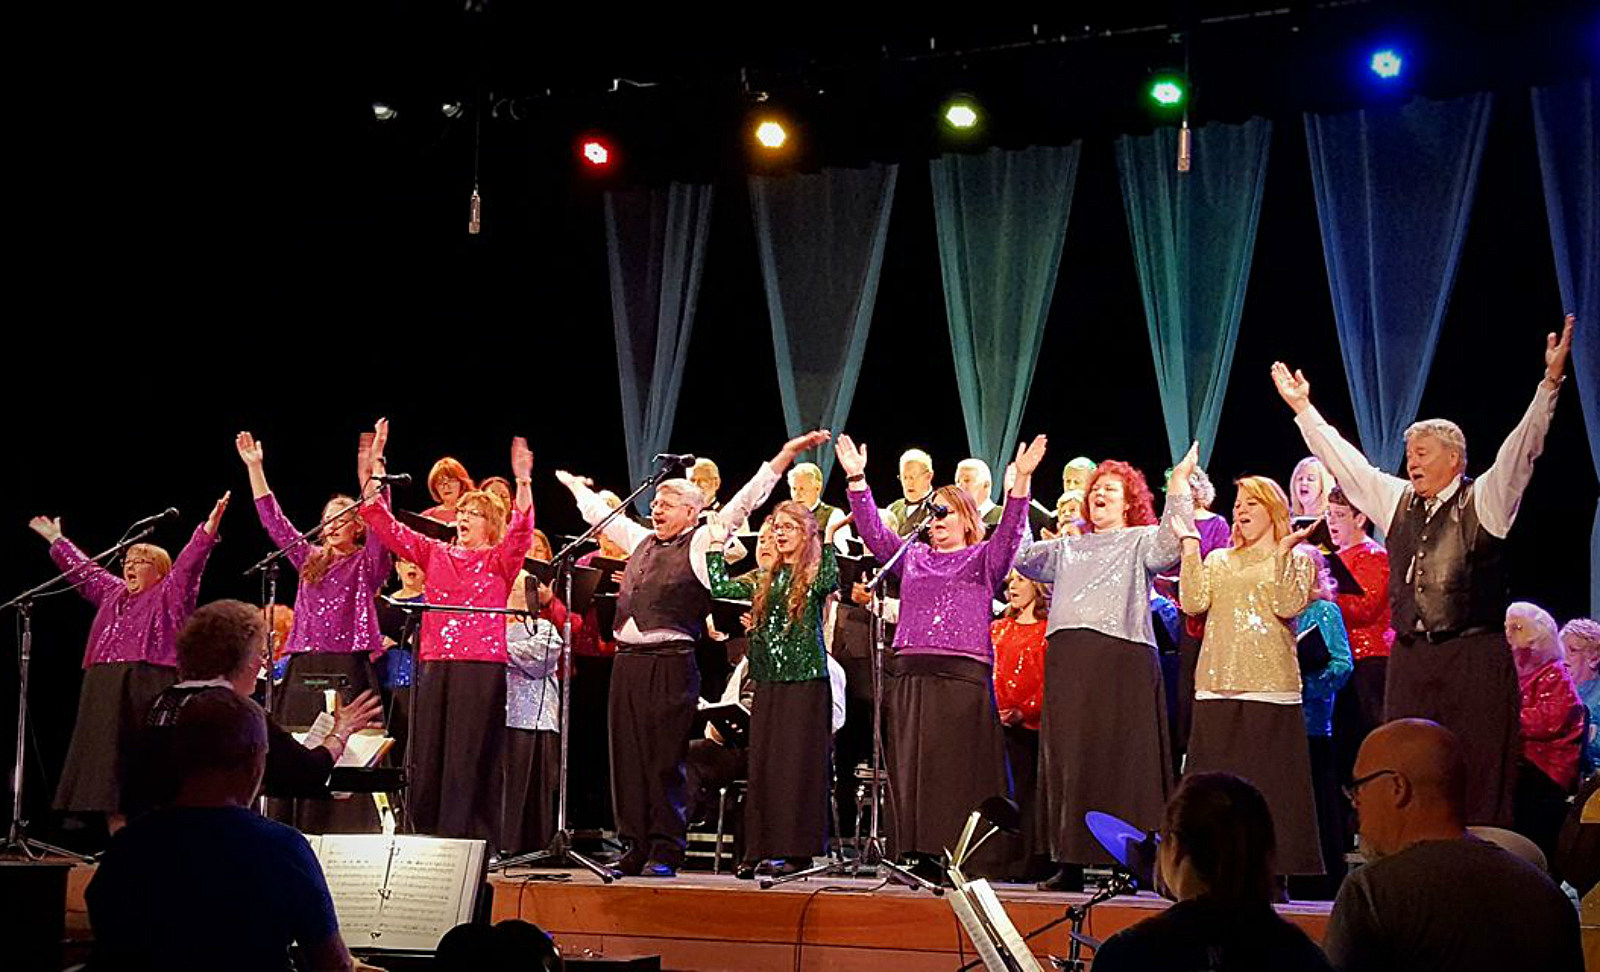 Photo by: Facebook/Celebration Singers, Inc